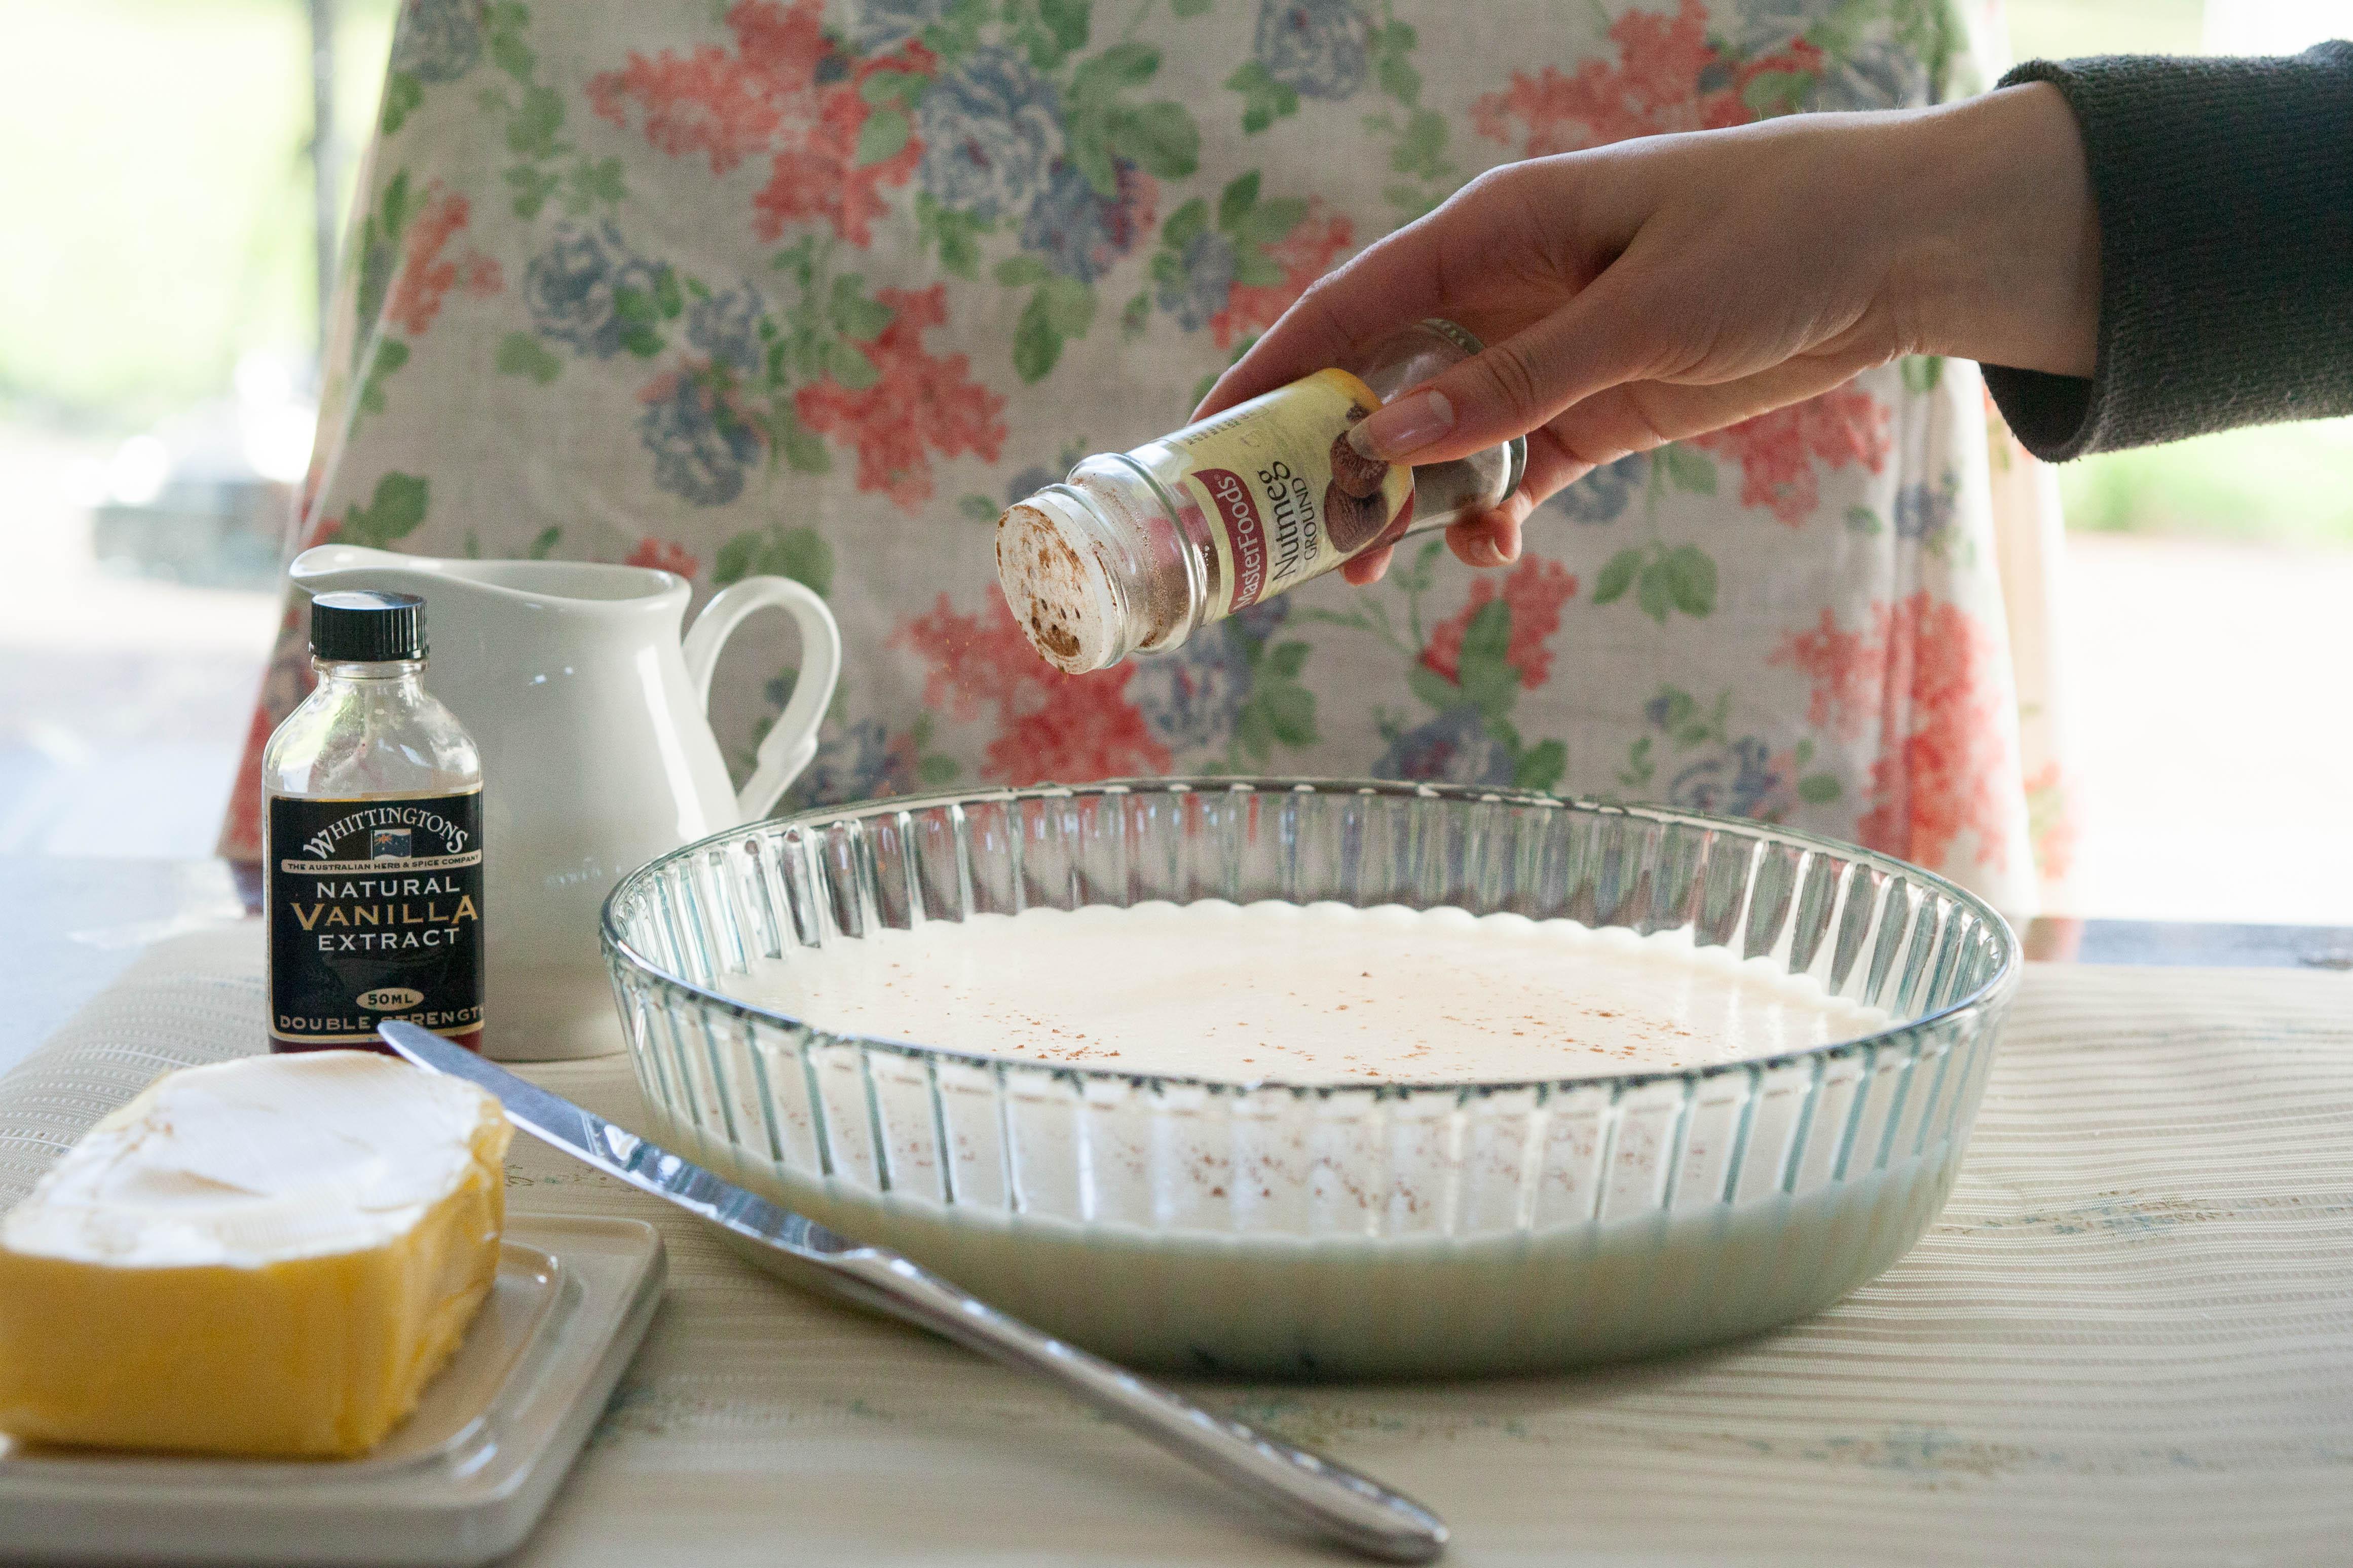 ricepudding-1-7